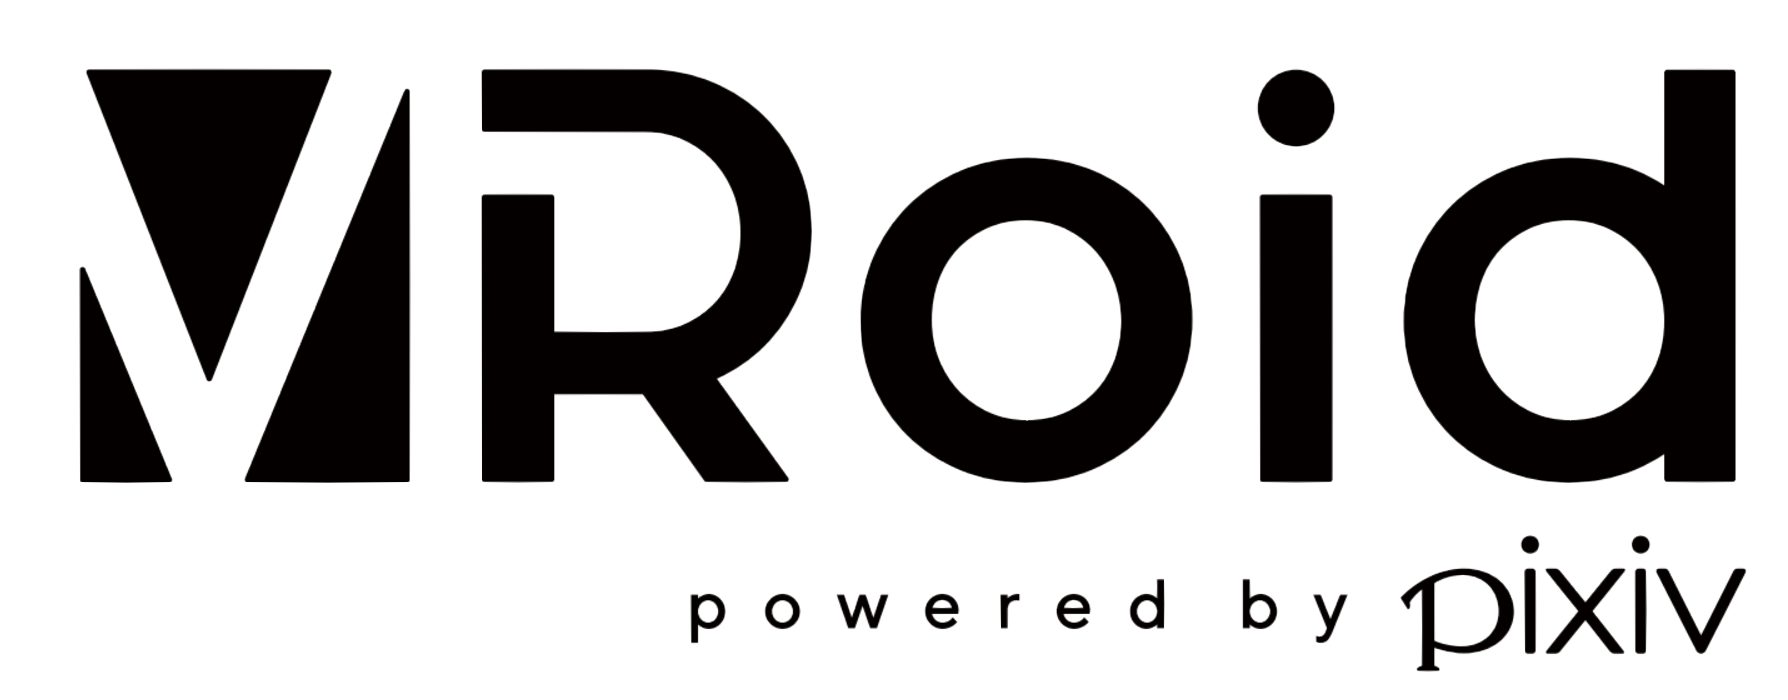 VRoid Studioの商用利用は可能ですか?